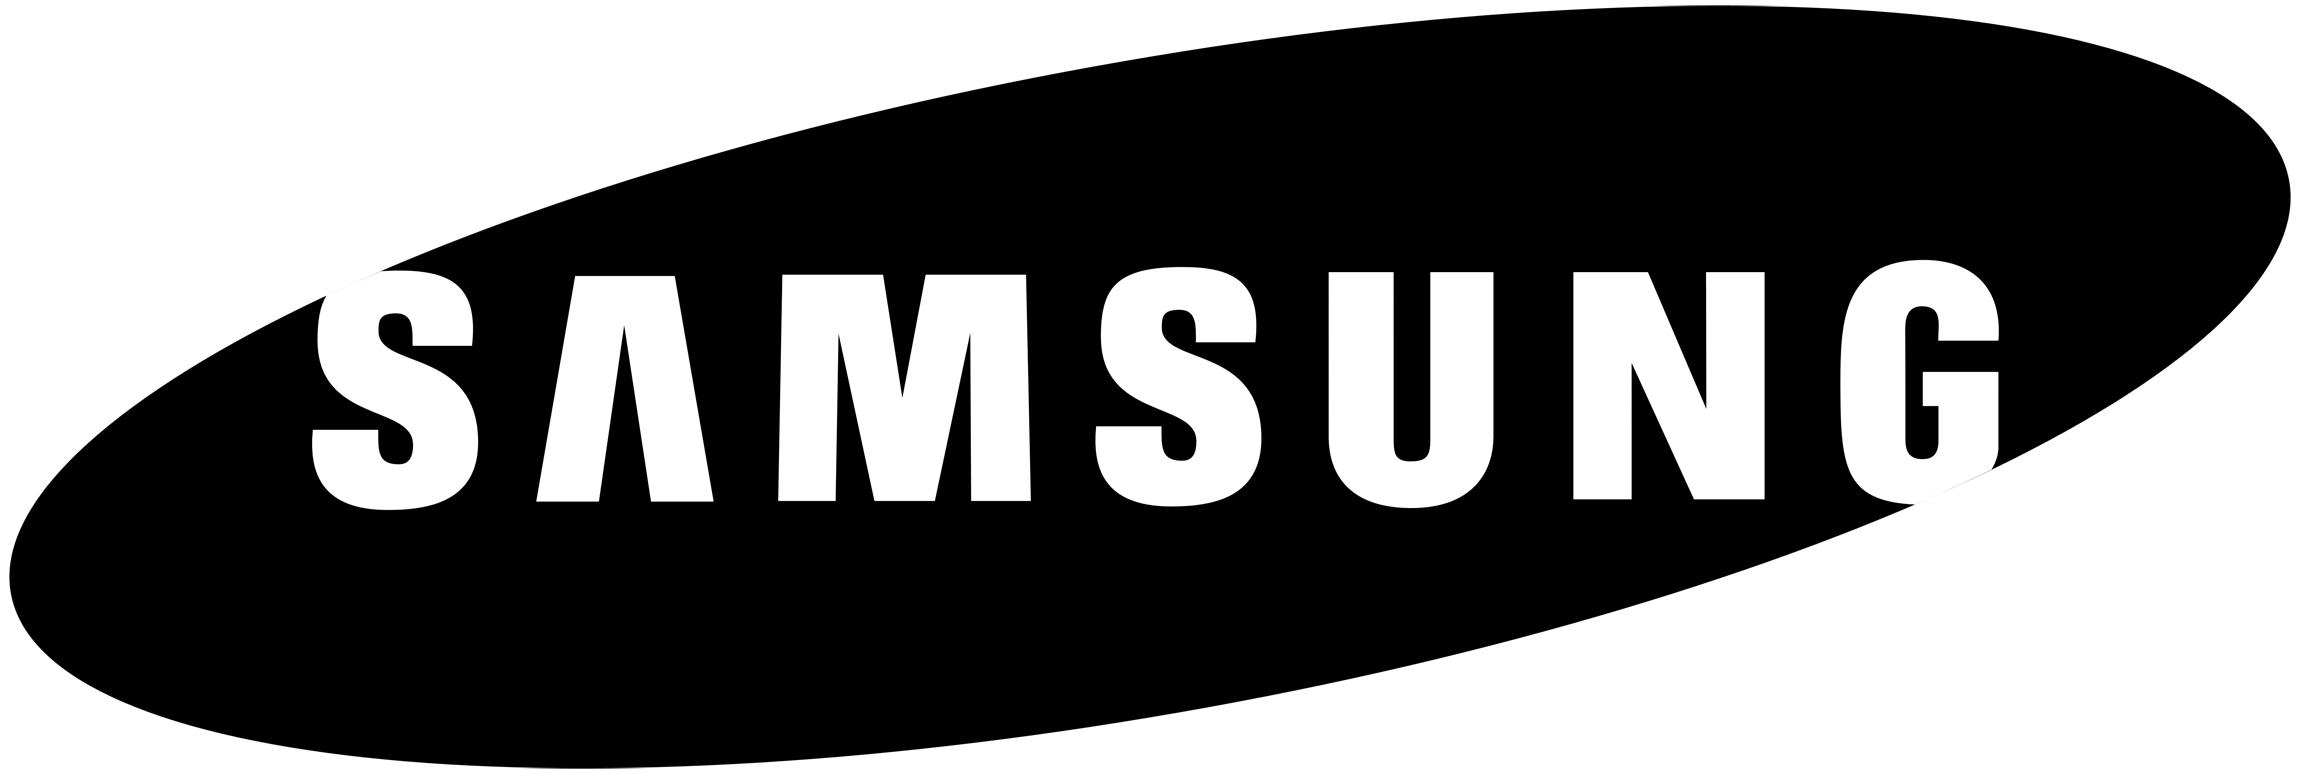 Samsung Logo DXF File Free Download.